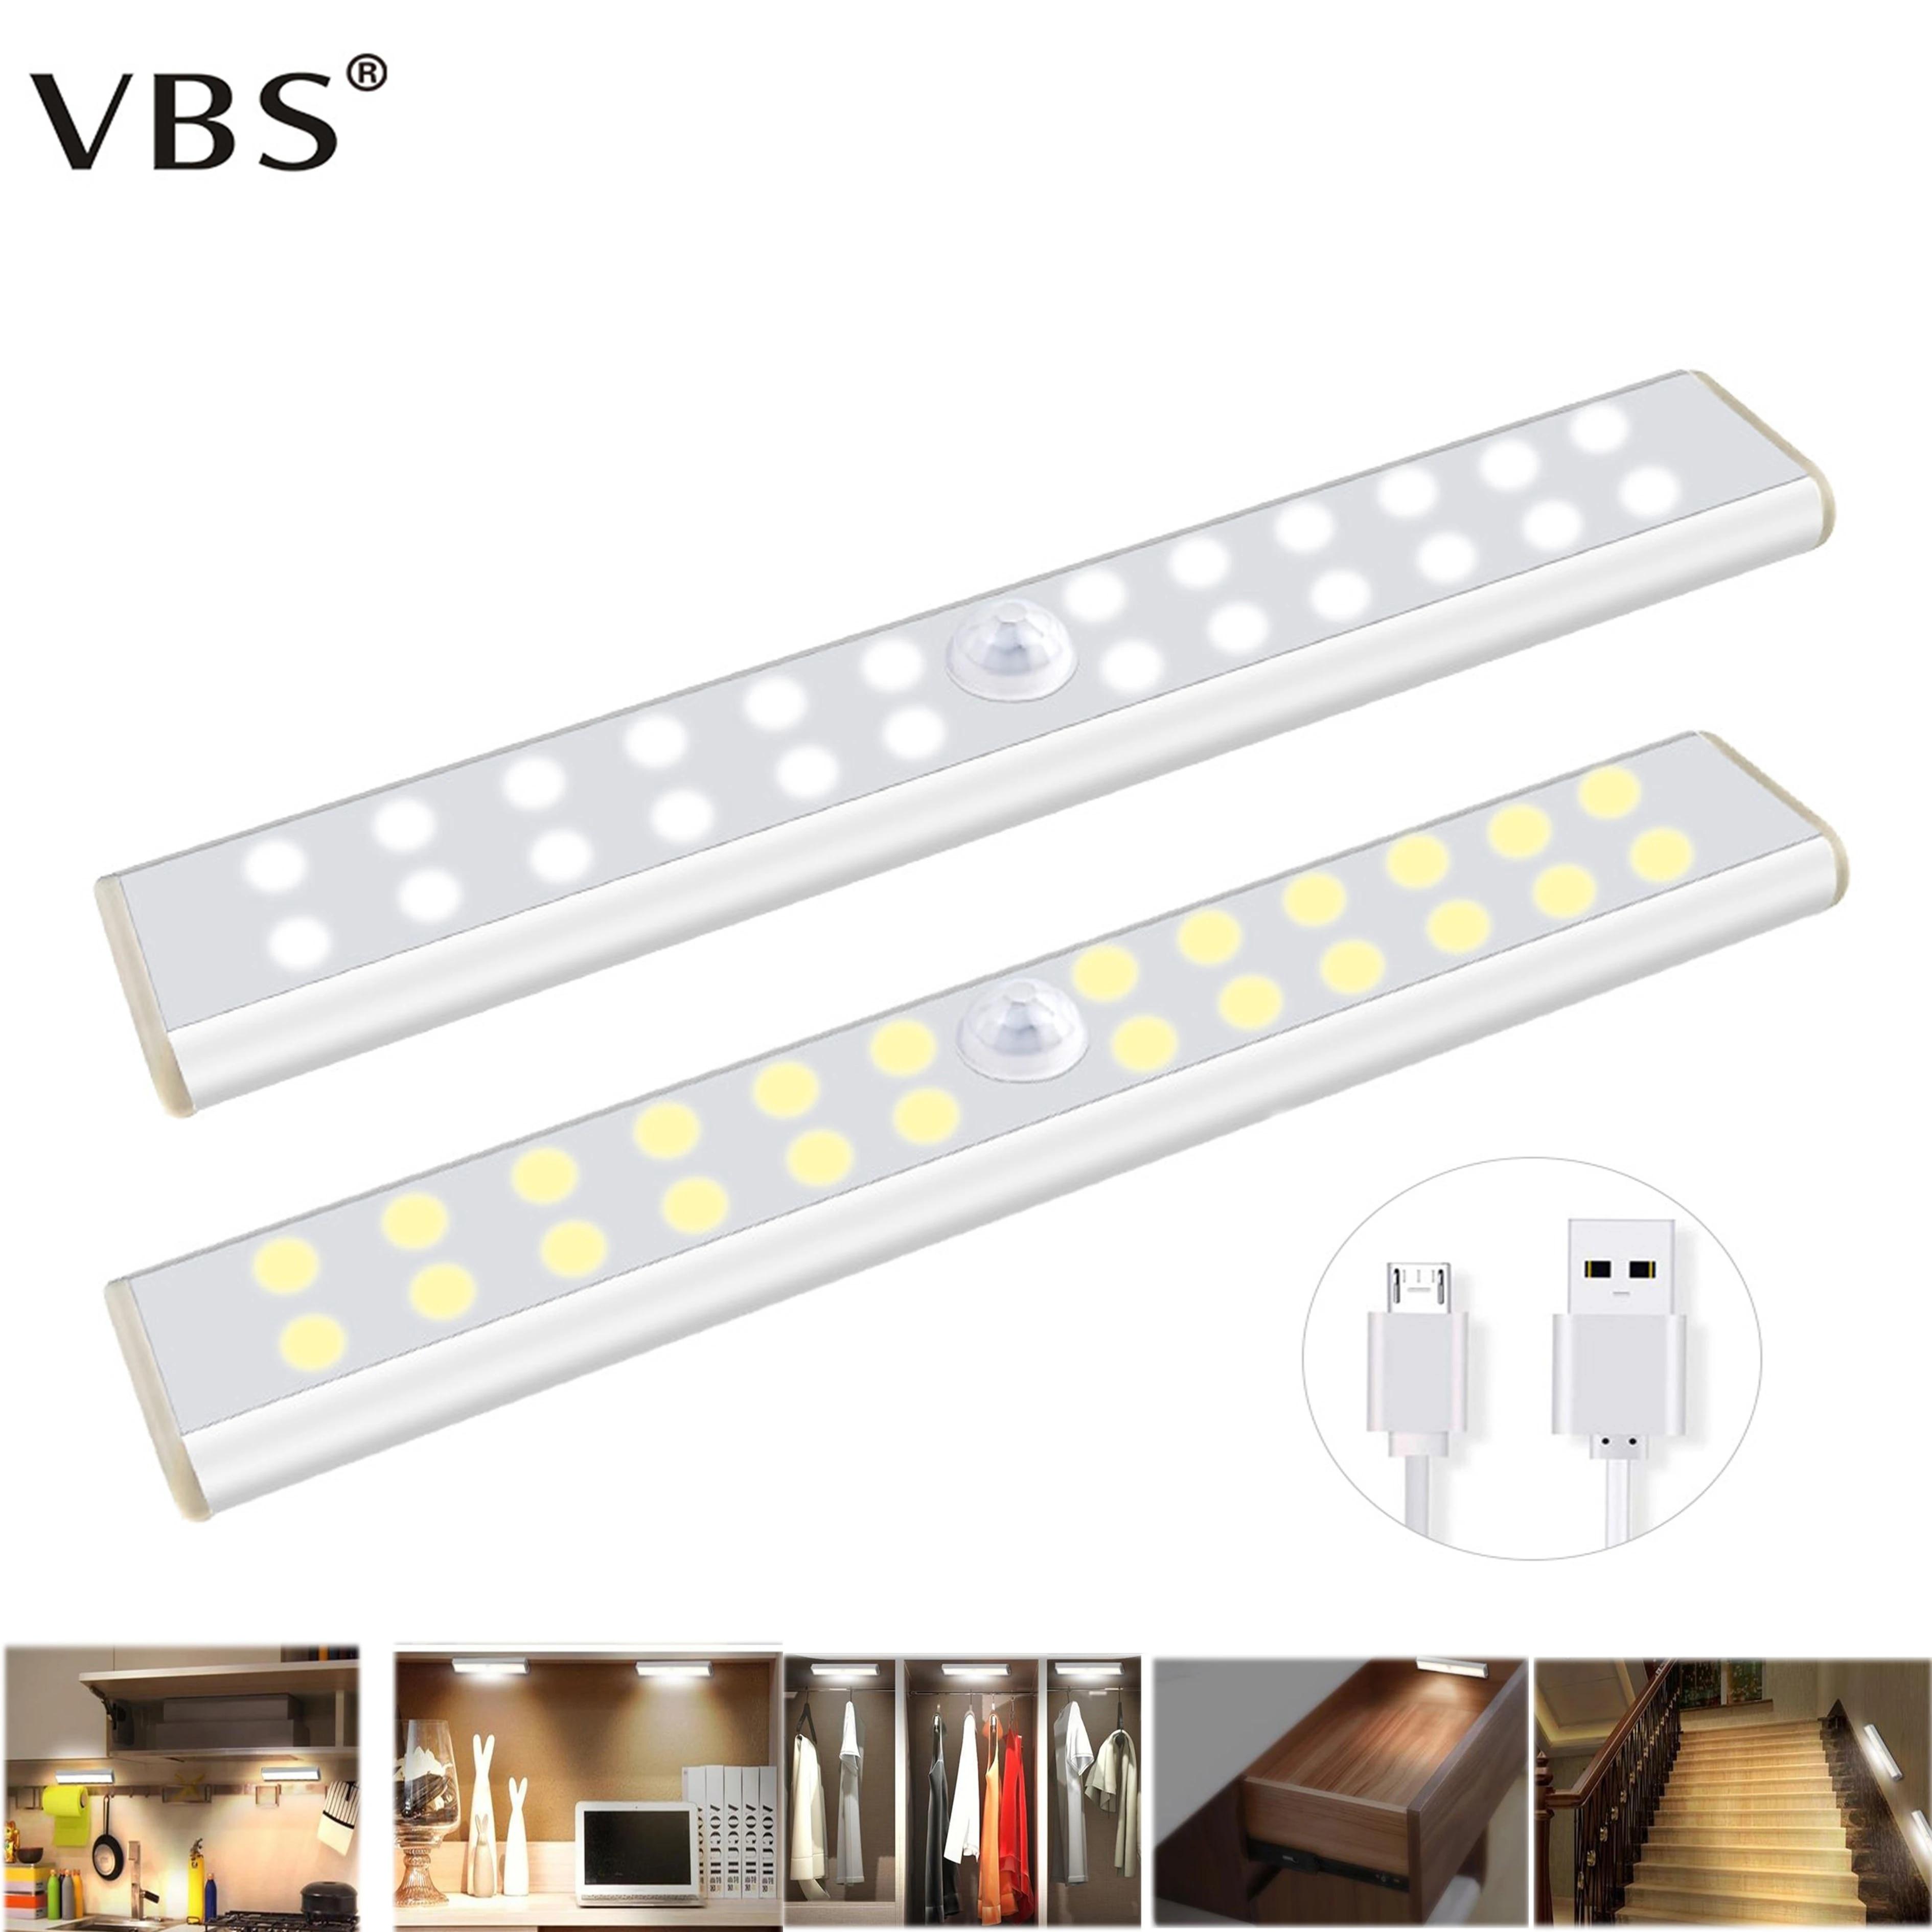 Led Under Cabinet Light Battery Lamp With Wireless Motion Sensor Wardrobe Light For Kitchen Cupboard Built In Battery Use Aaa Under Cabinet Lights Aliexpress